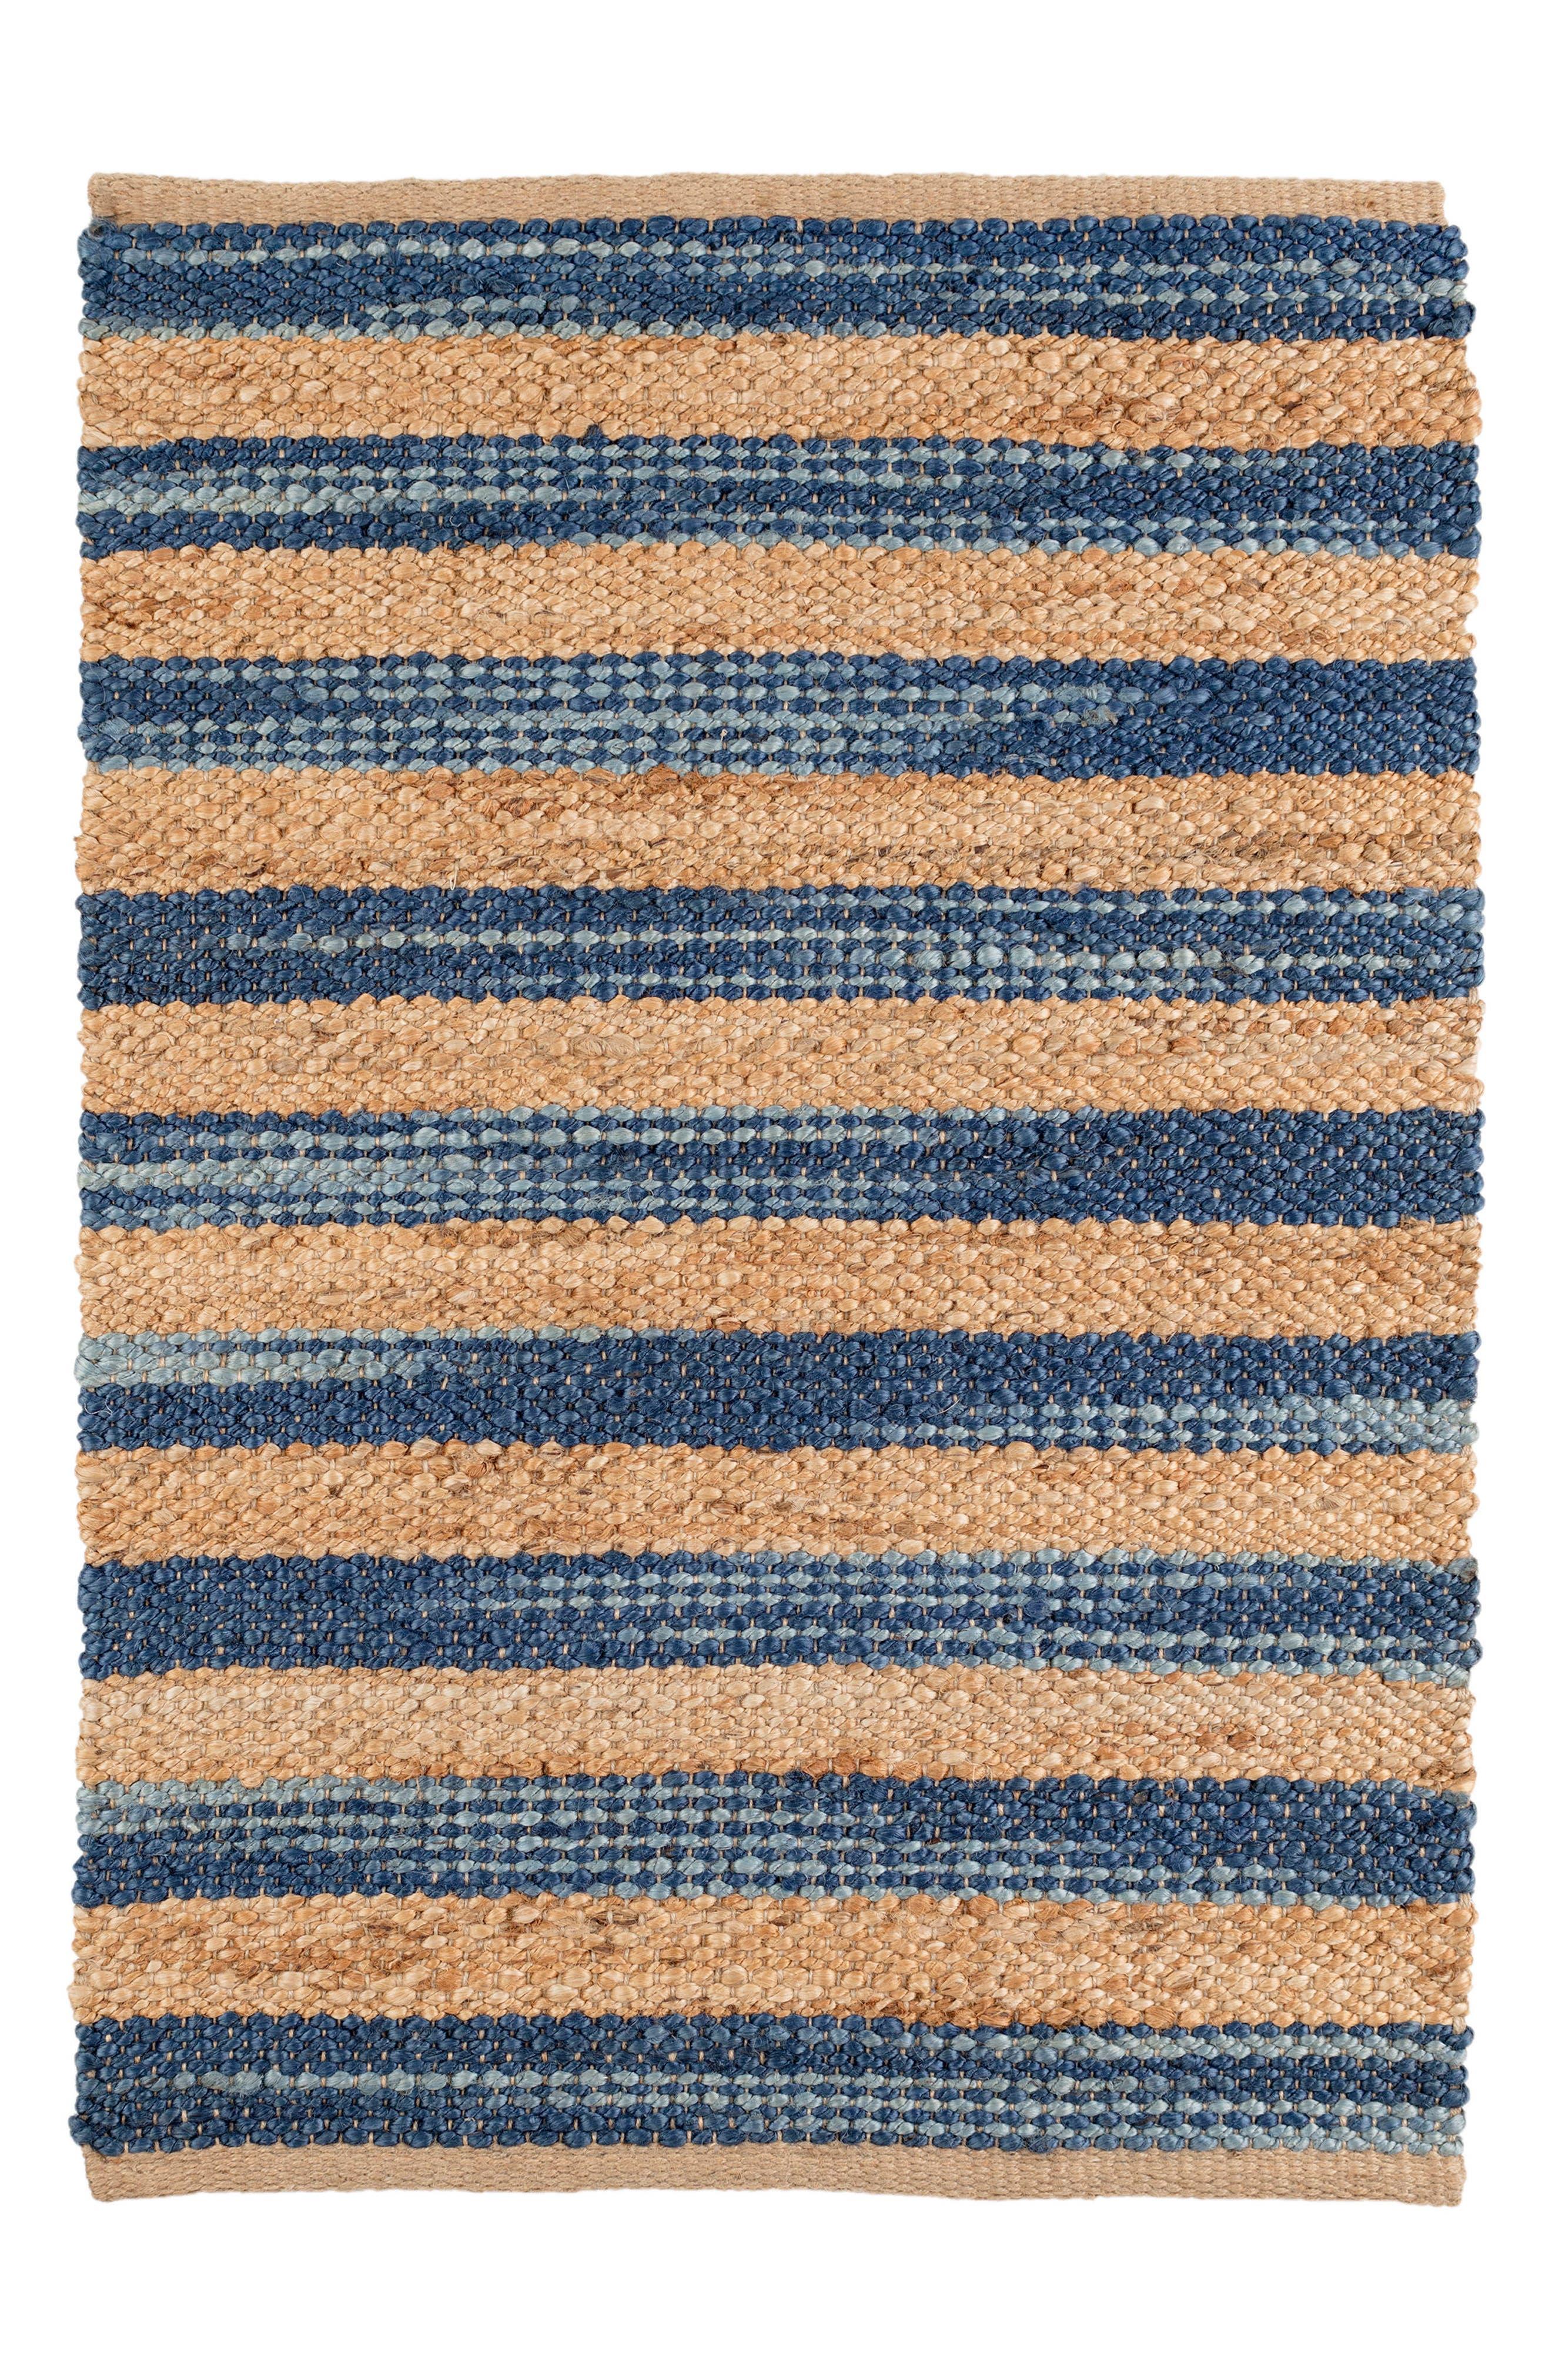 Corfu Woven Wool Rug,                         Main,                         color, Blue